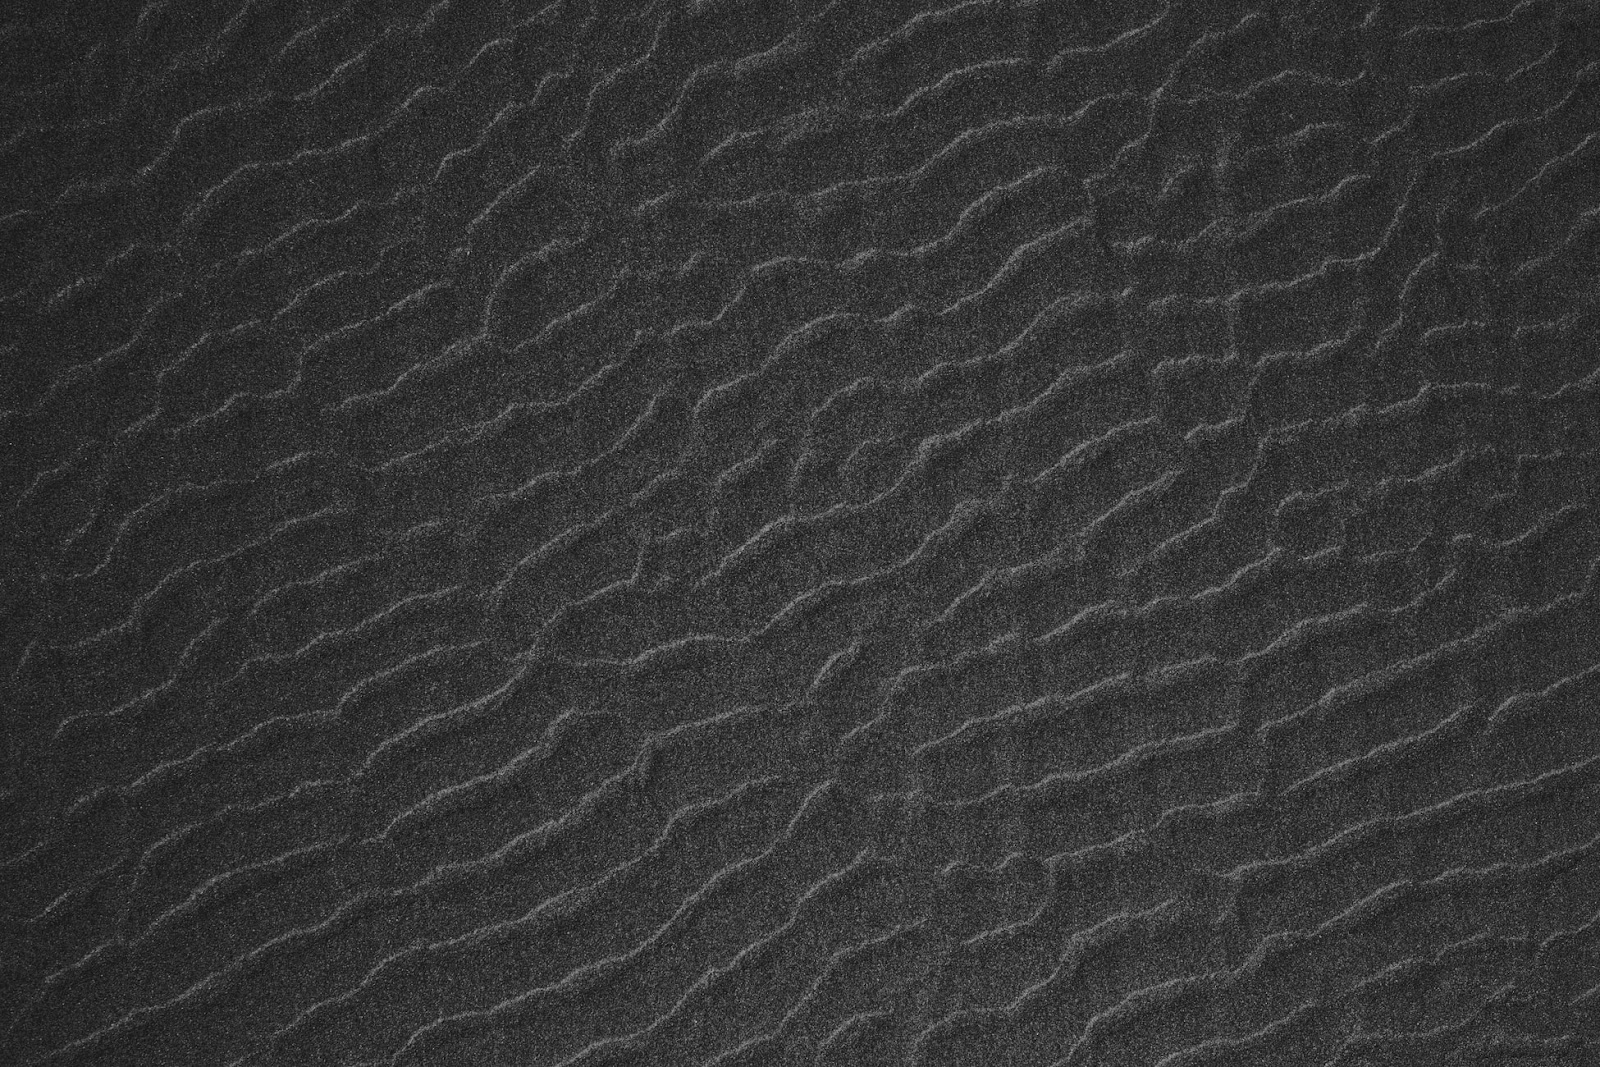 Textured black linkedin background